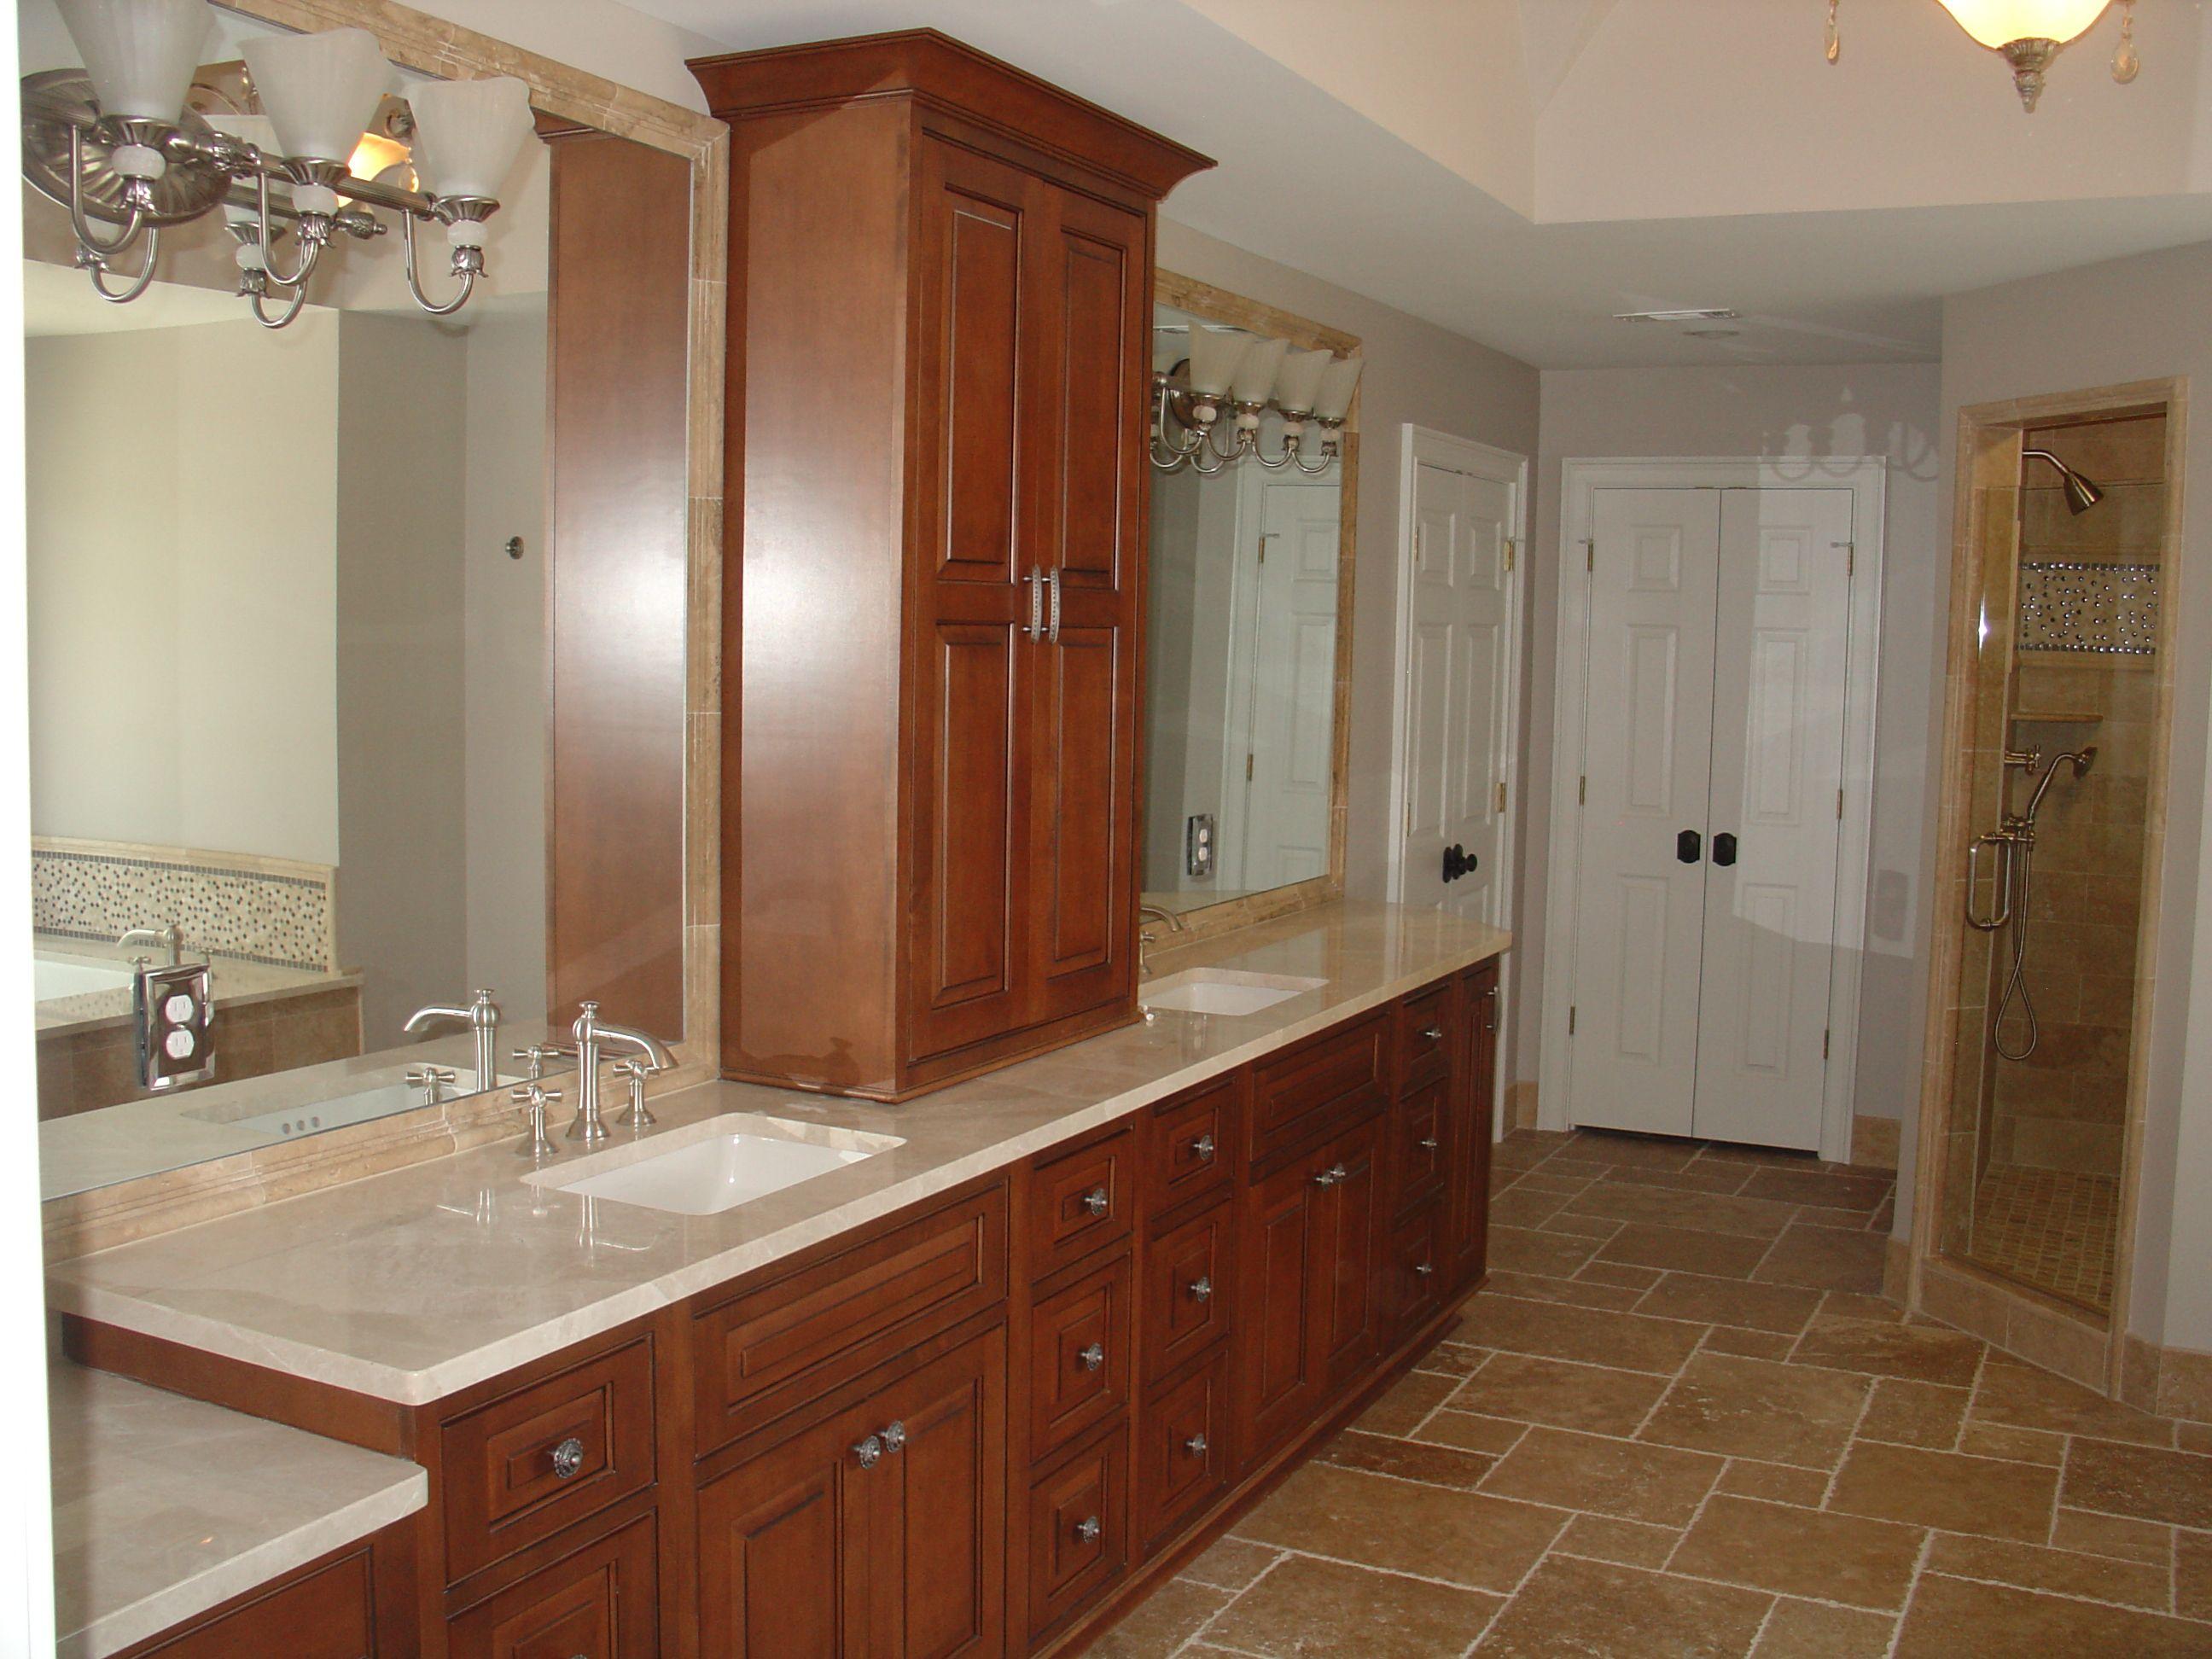 Ordinaire Atlanta Bathroom Remodel By Penn Carpentry   #homeimprovement  #generalcontractor